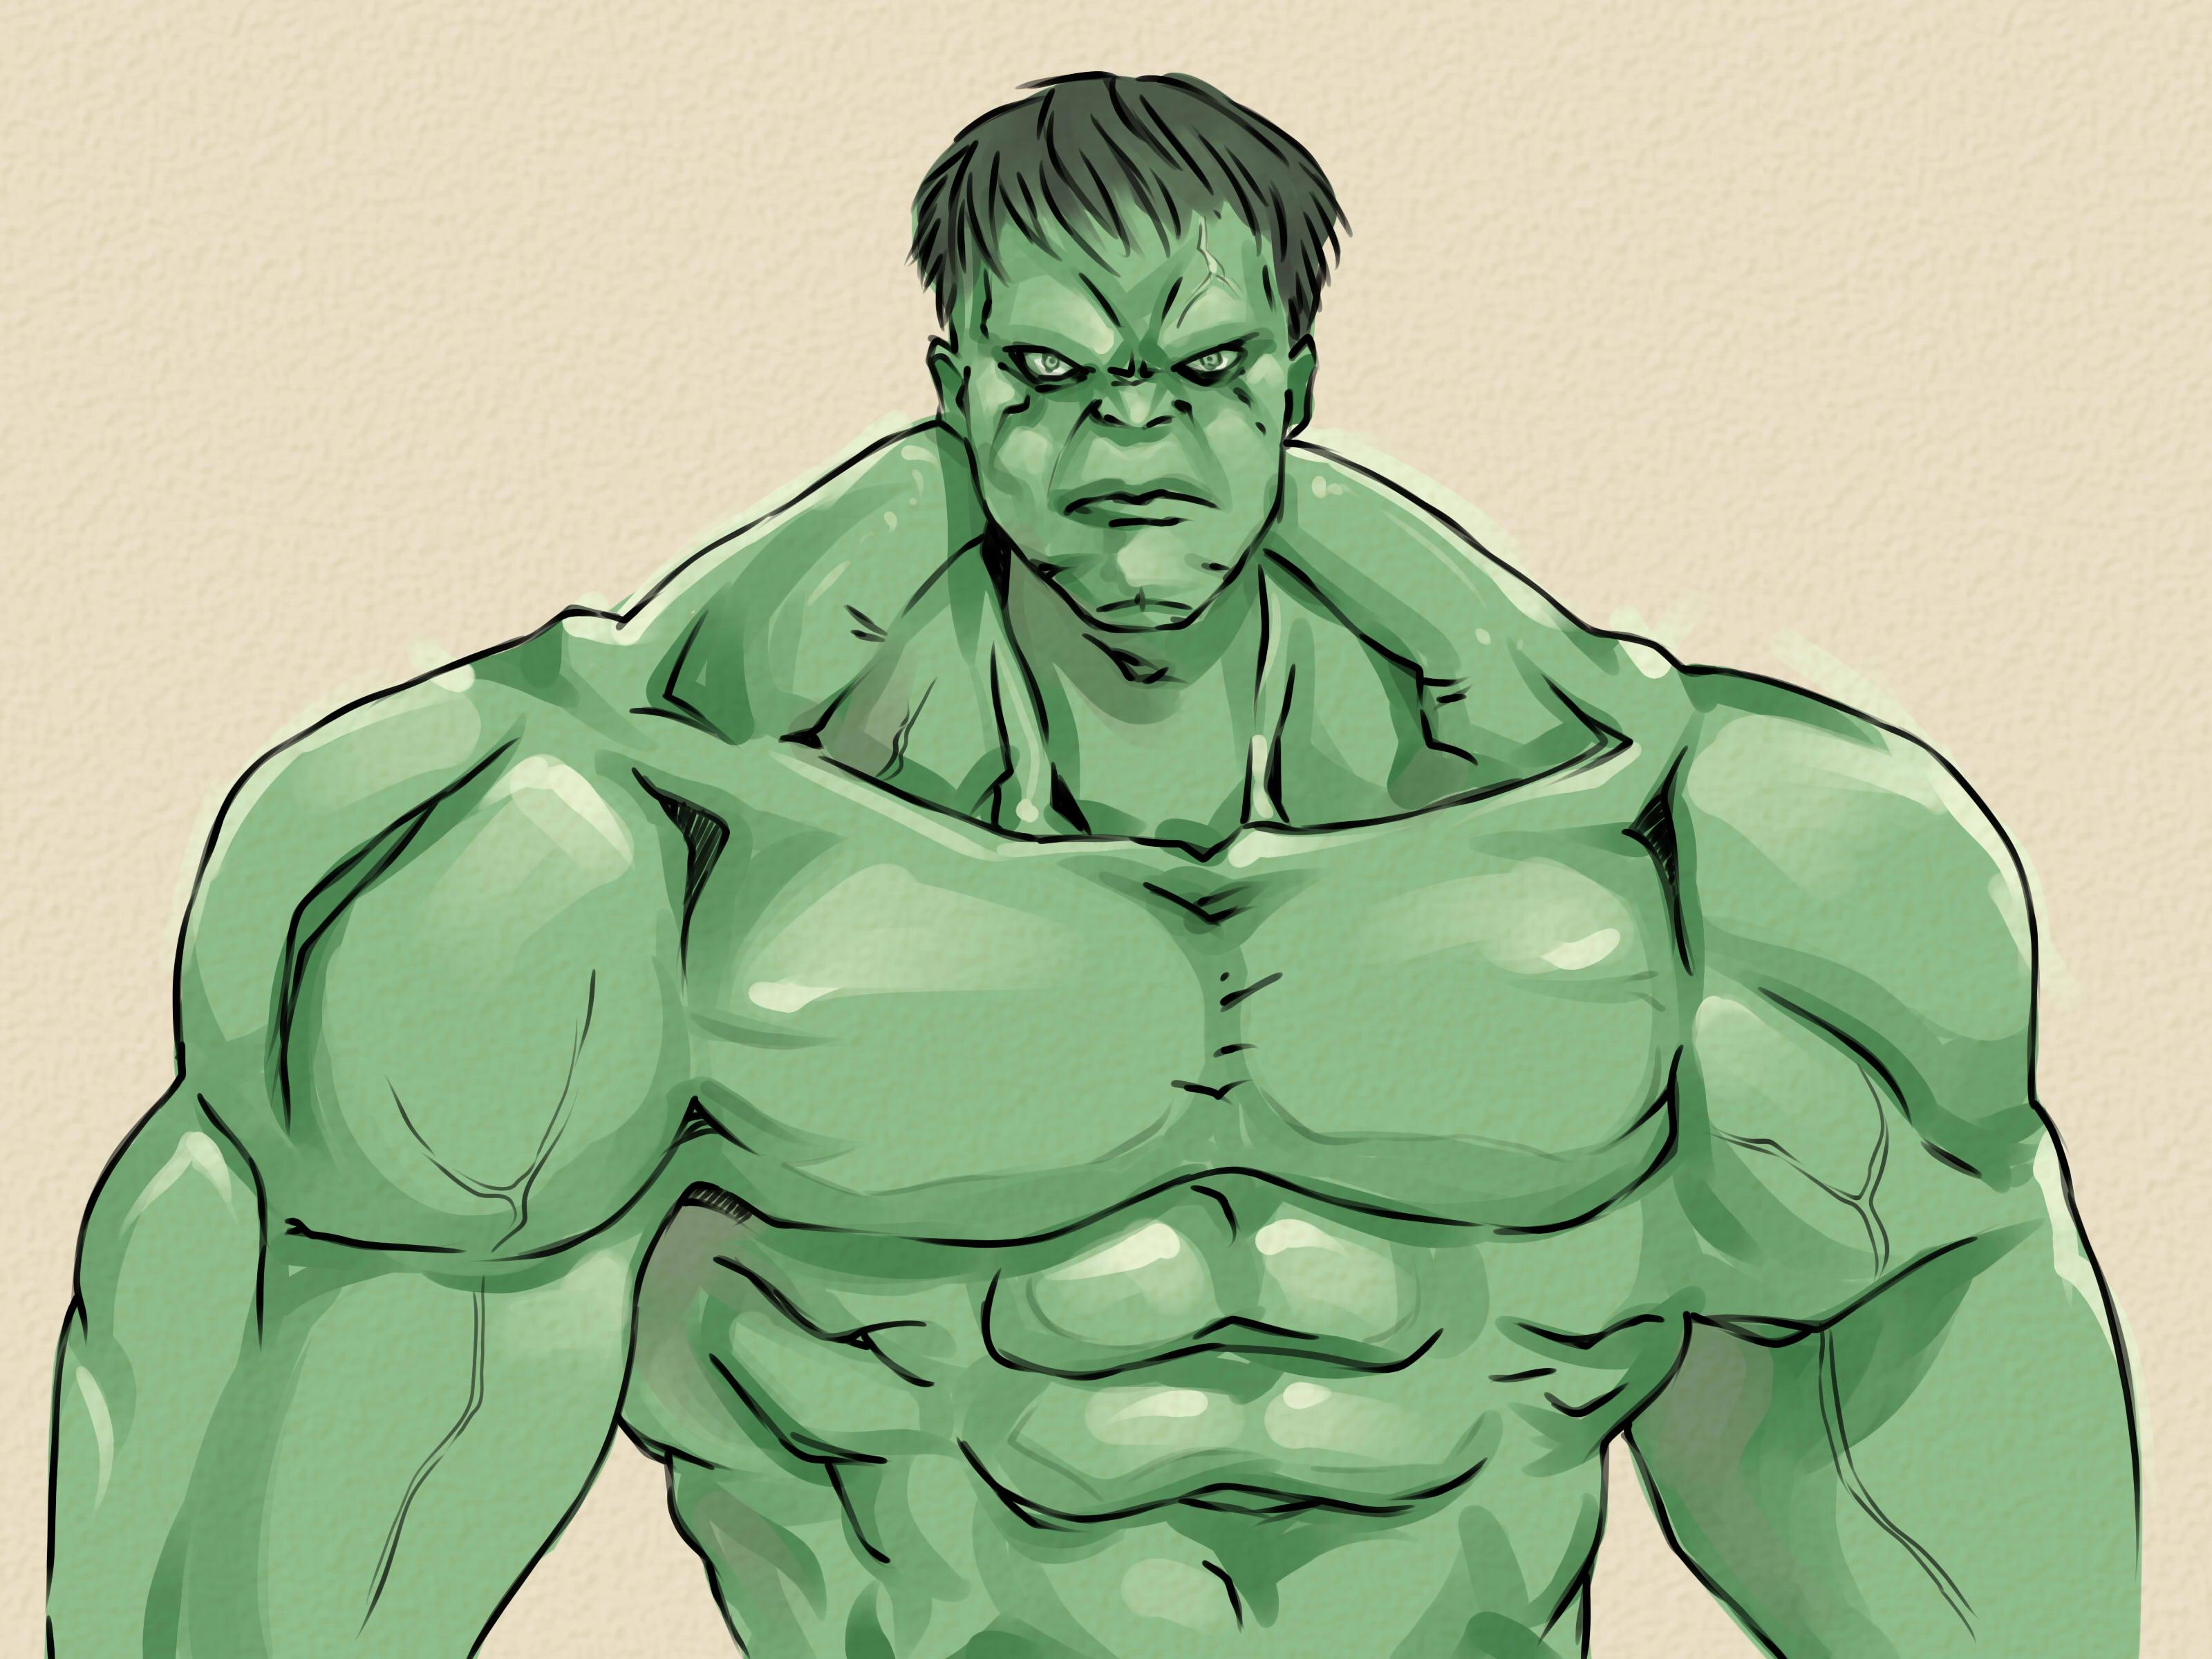 3200x2400 Incredible Hulk Face Drawing Incredible Hulk Face Related Keywords